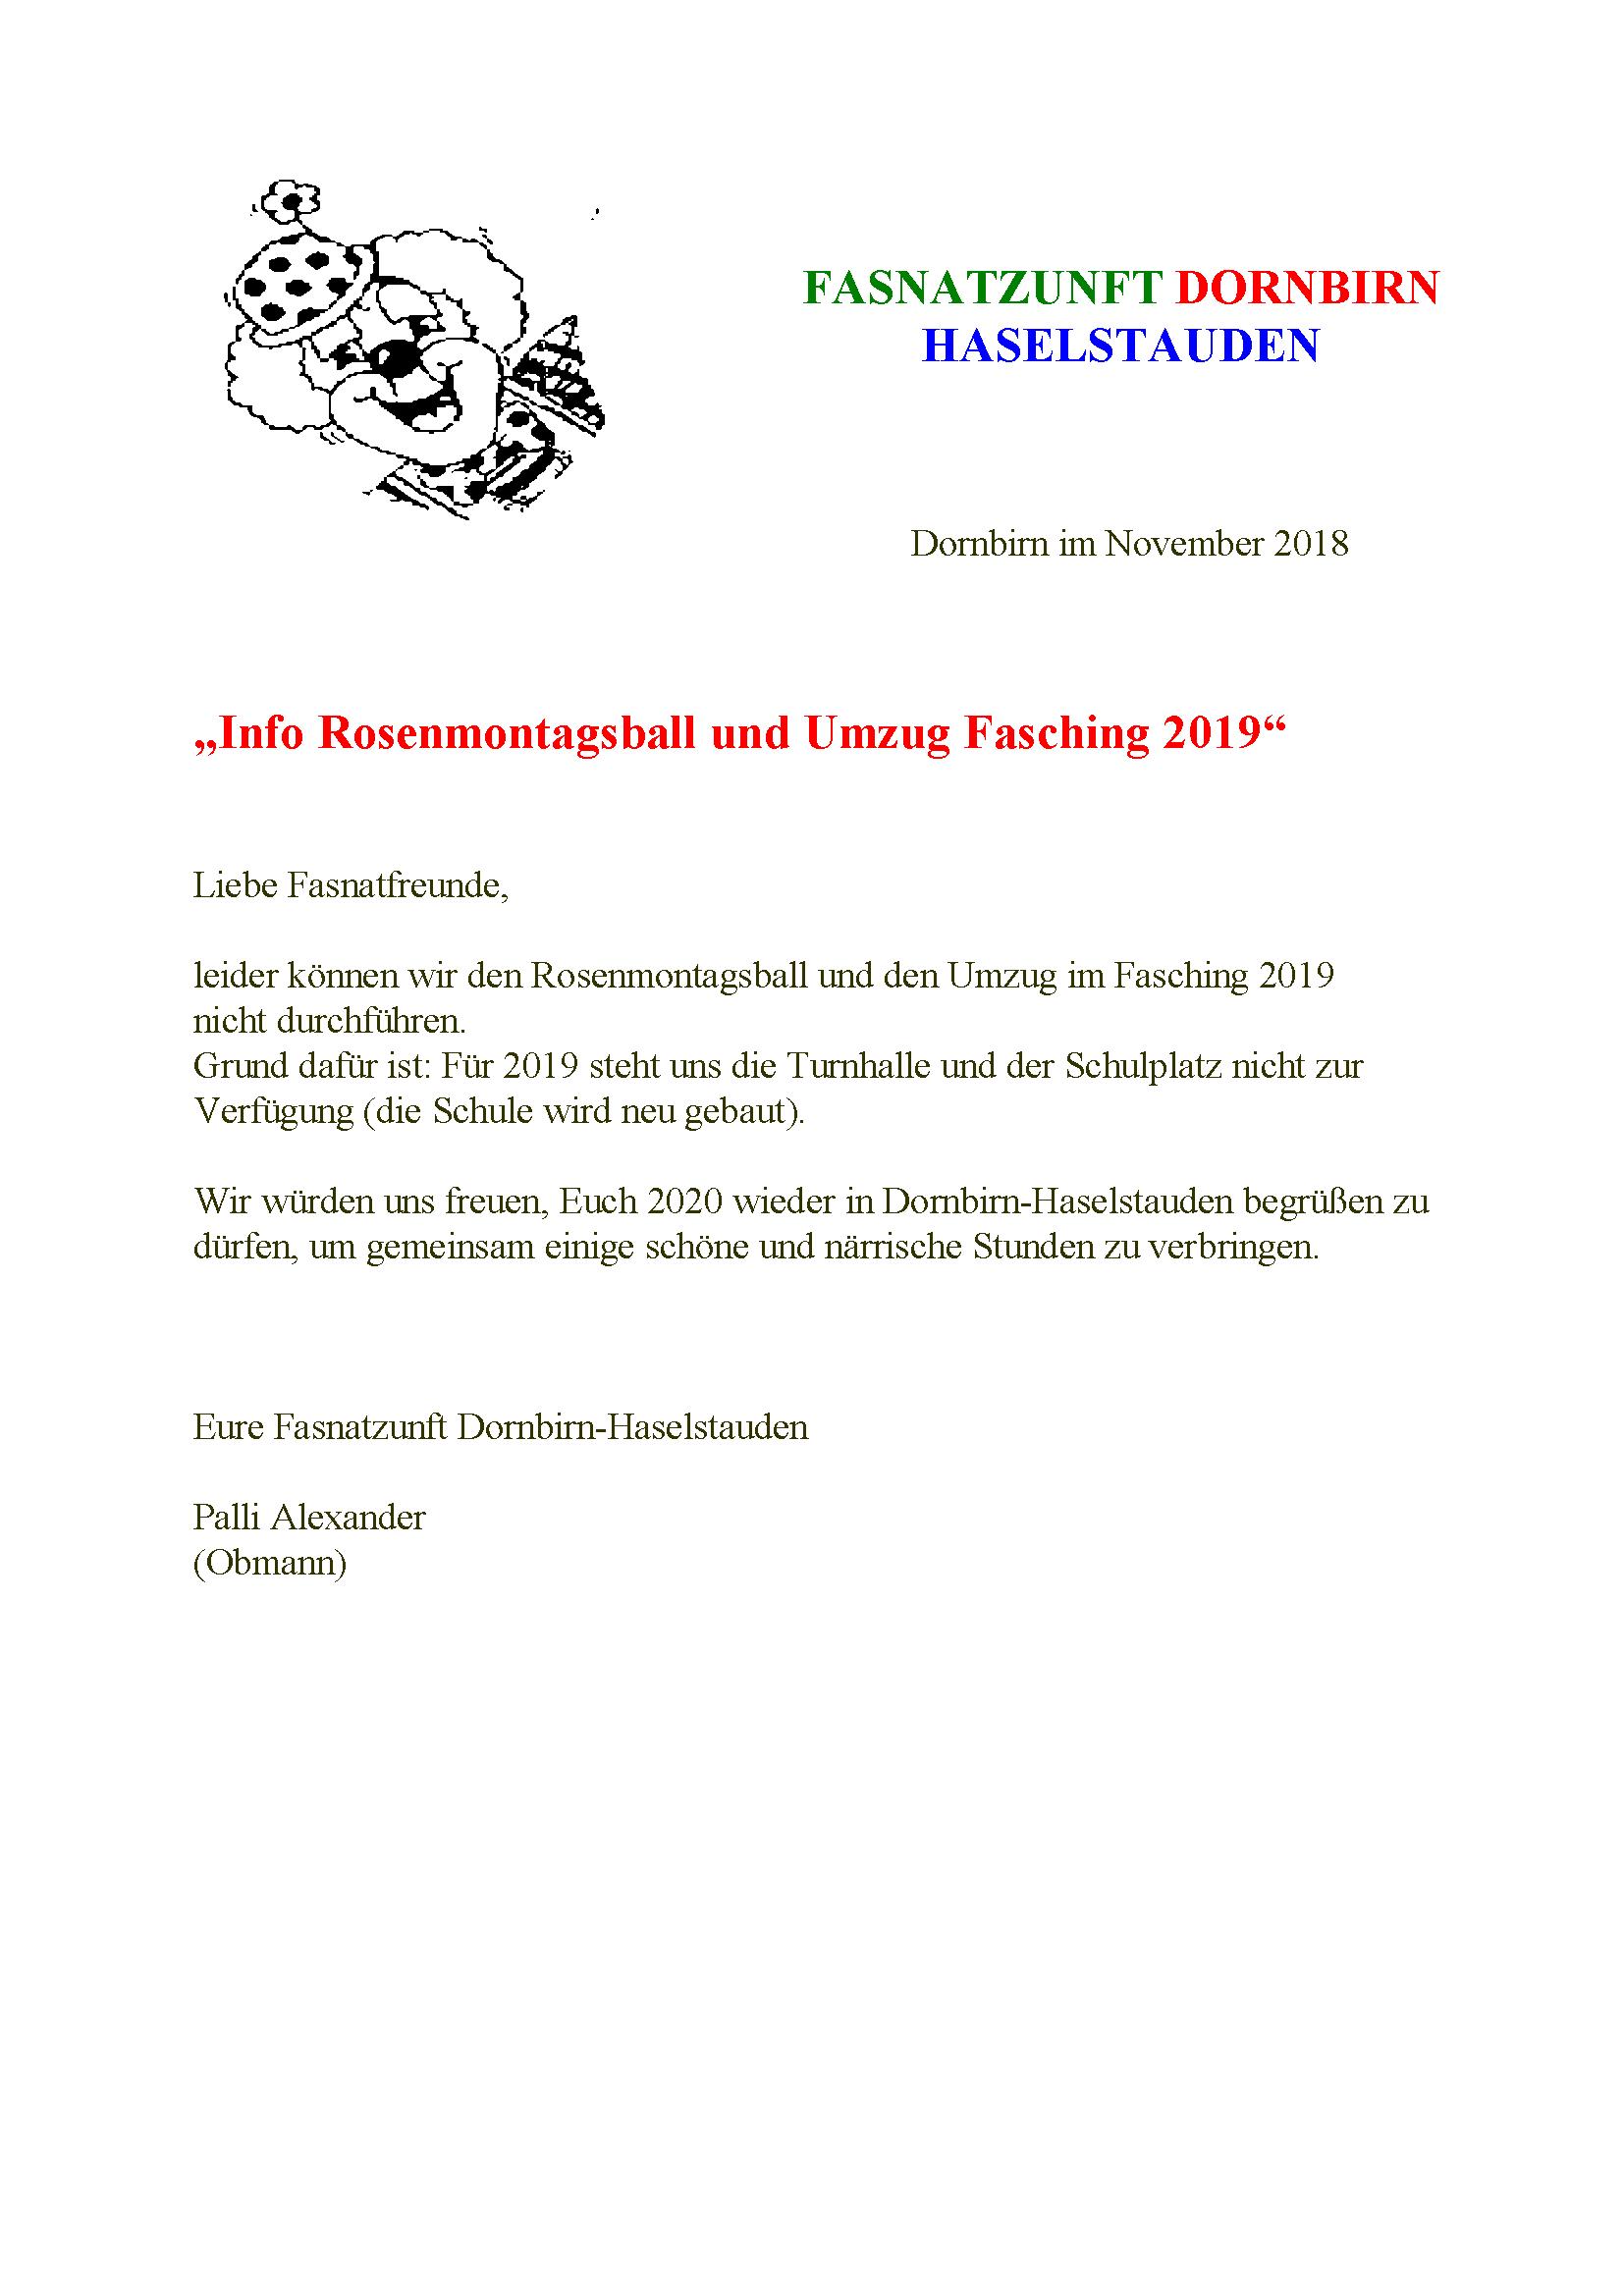 Dornbirner Fasnat Zunft Kein Umzug Dornbirn Haselstauden 2019